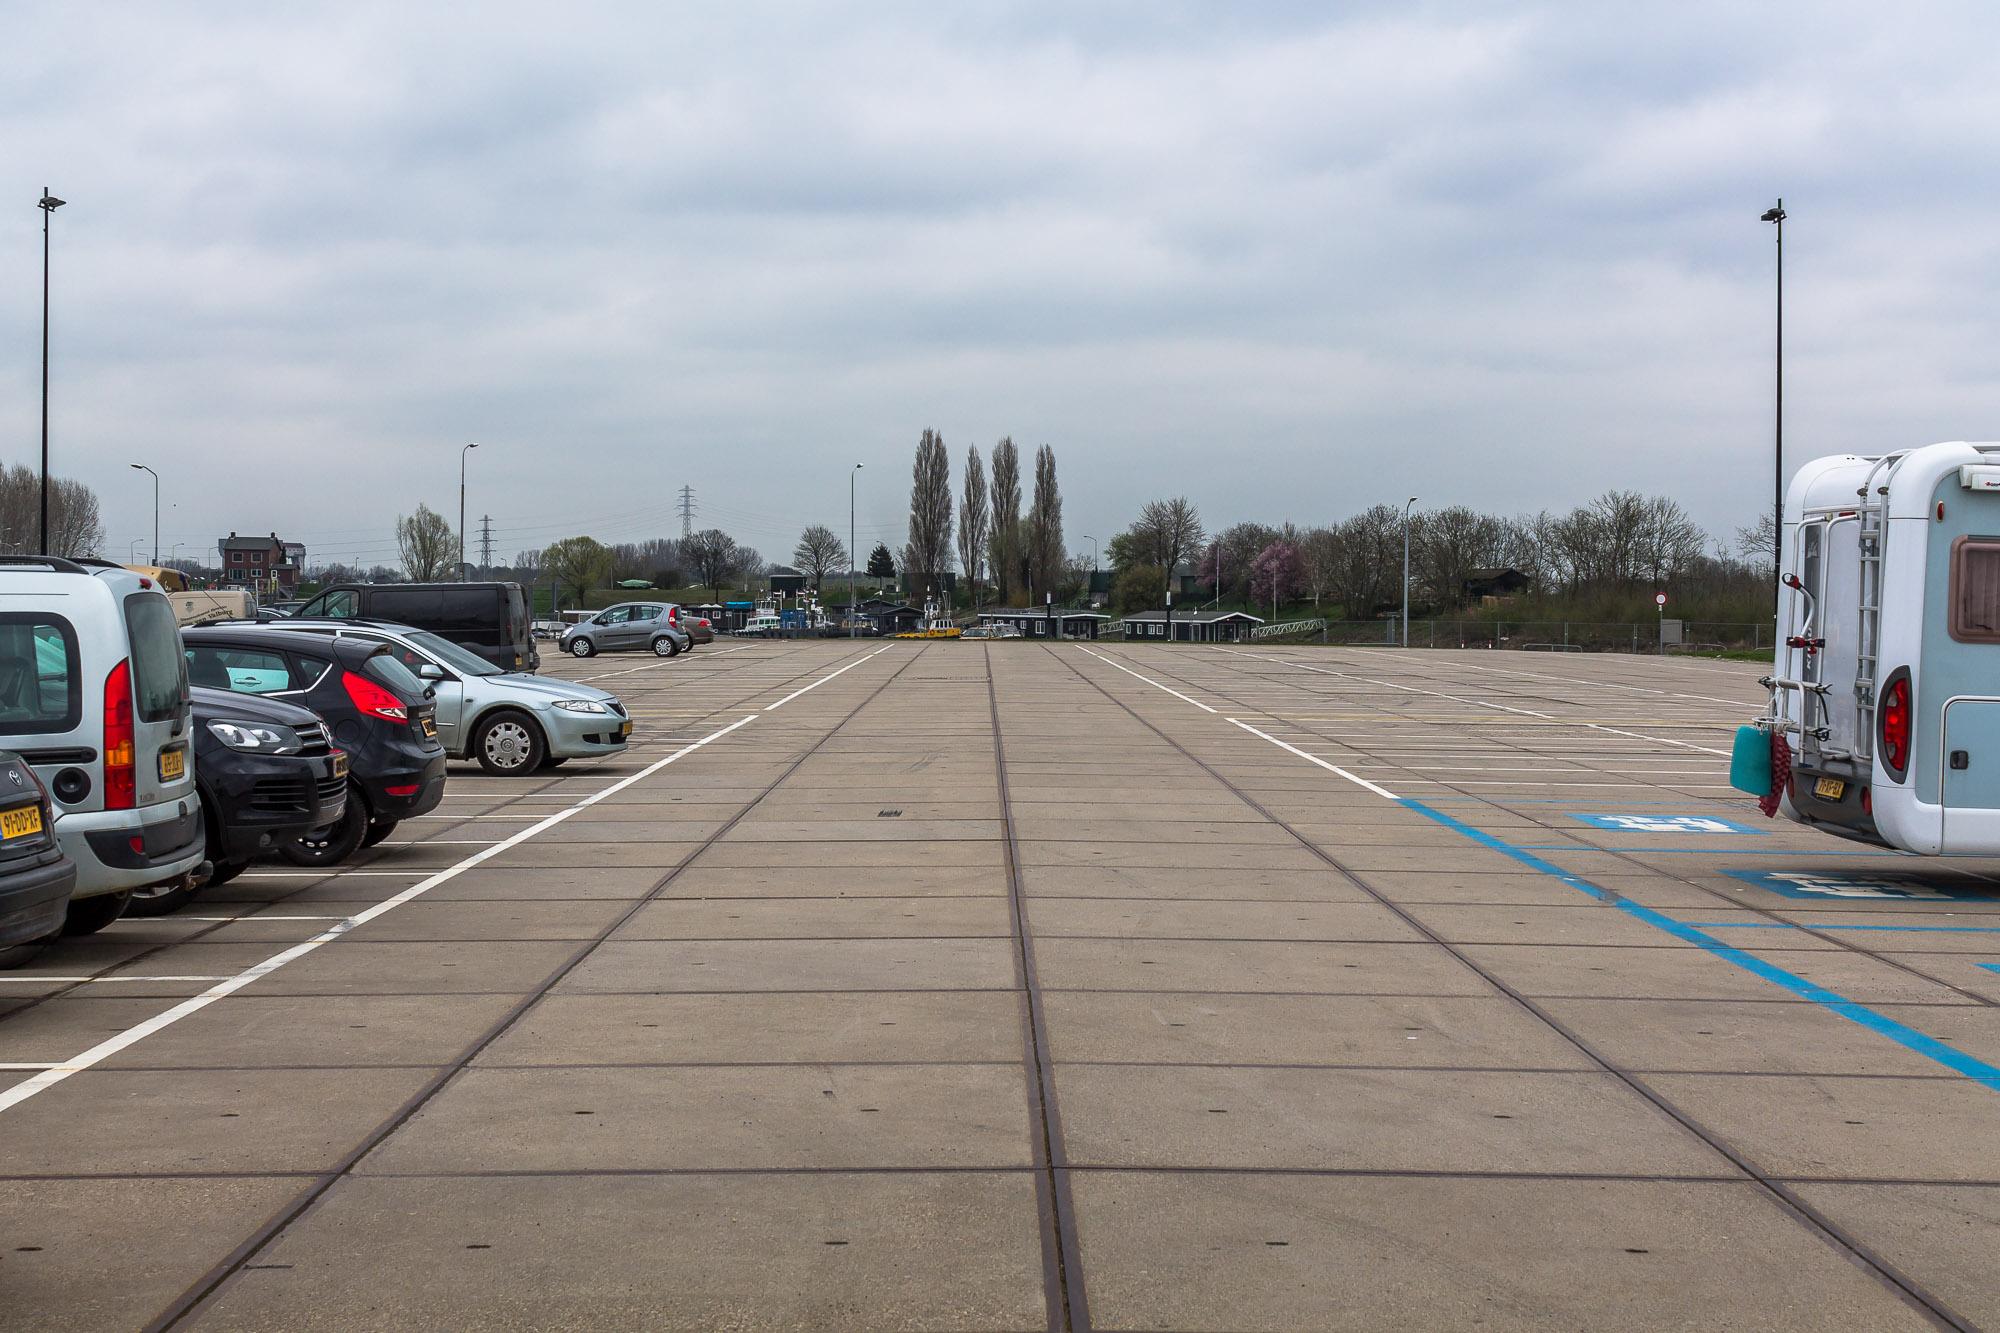 Leeg parkeerterrein